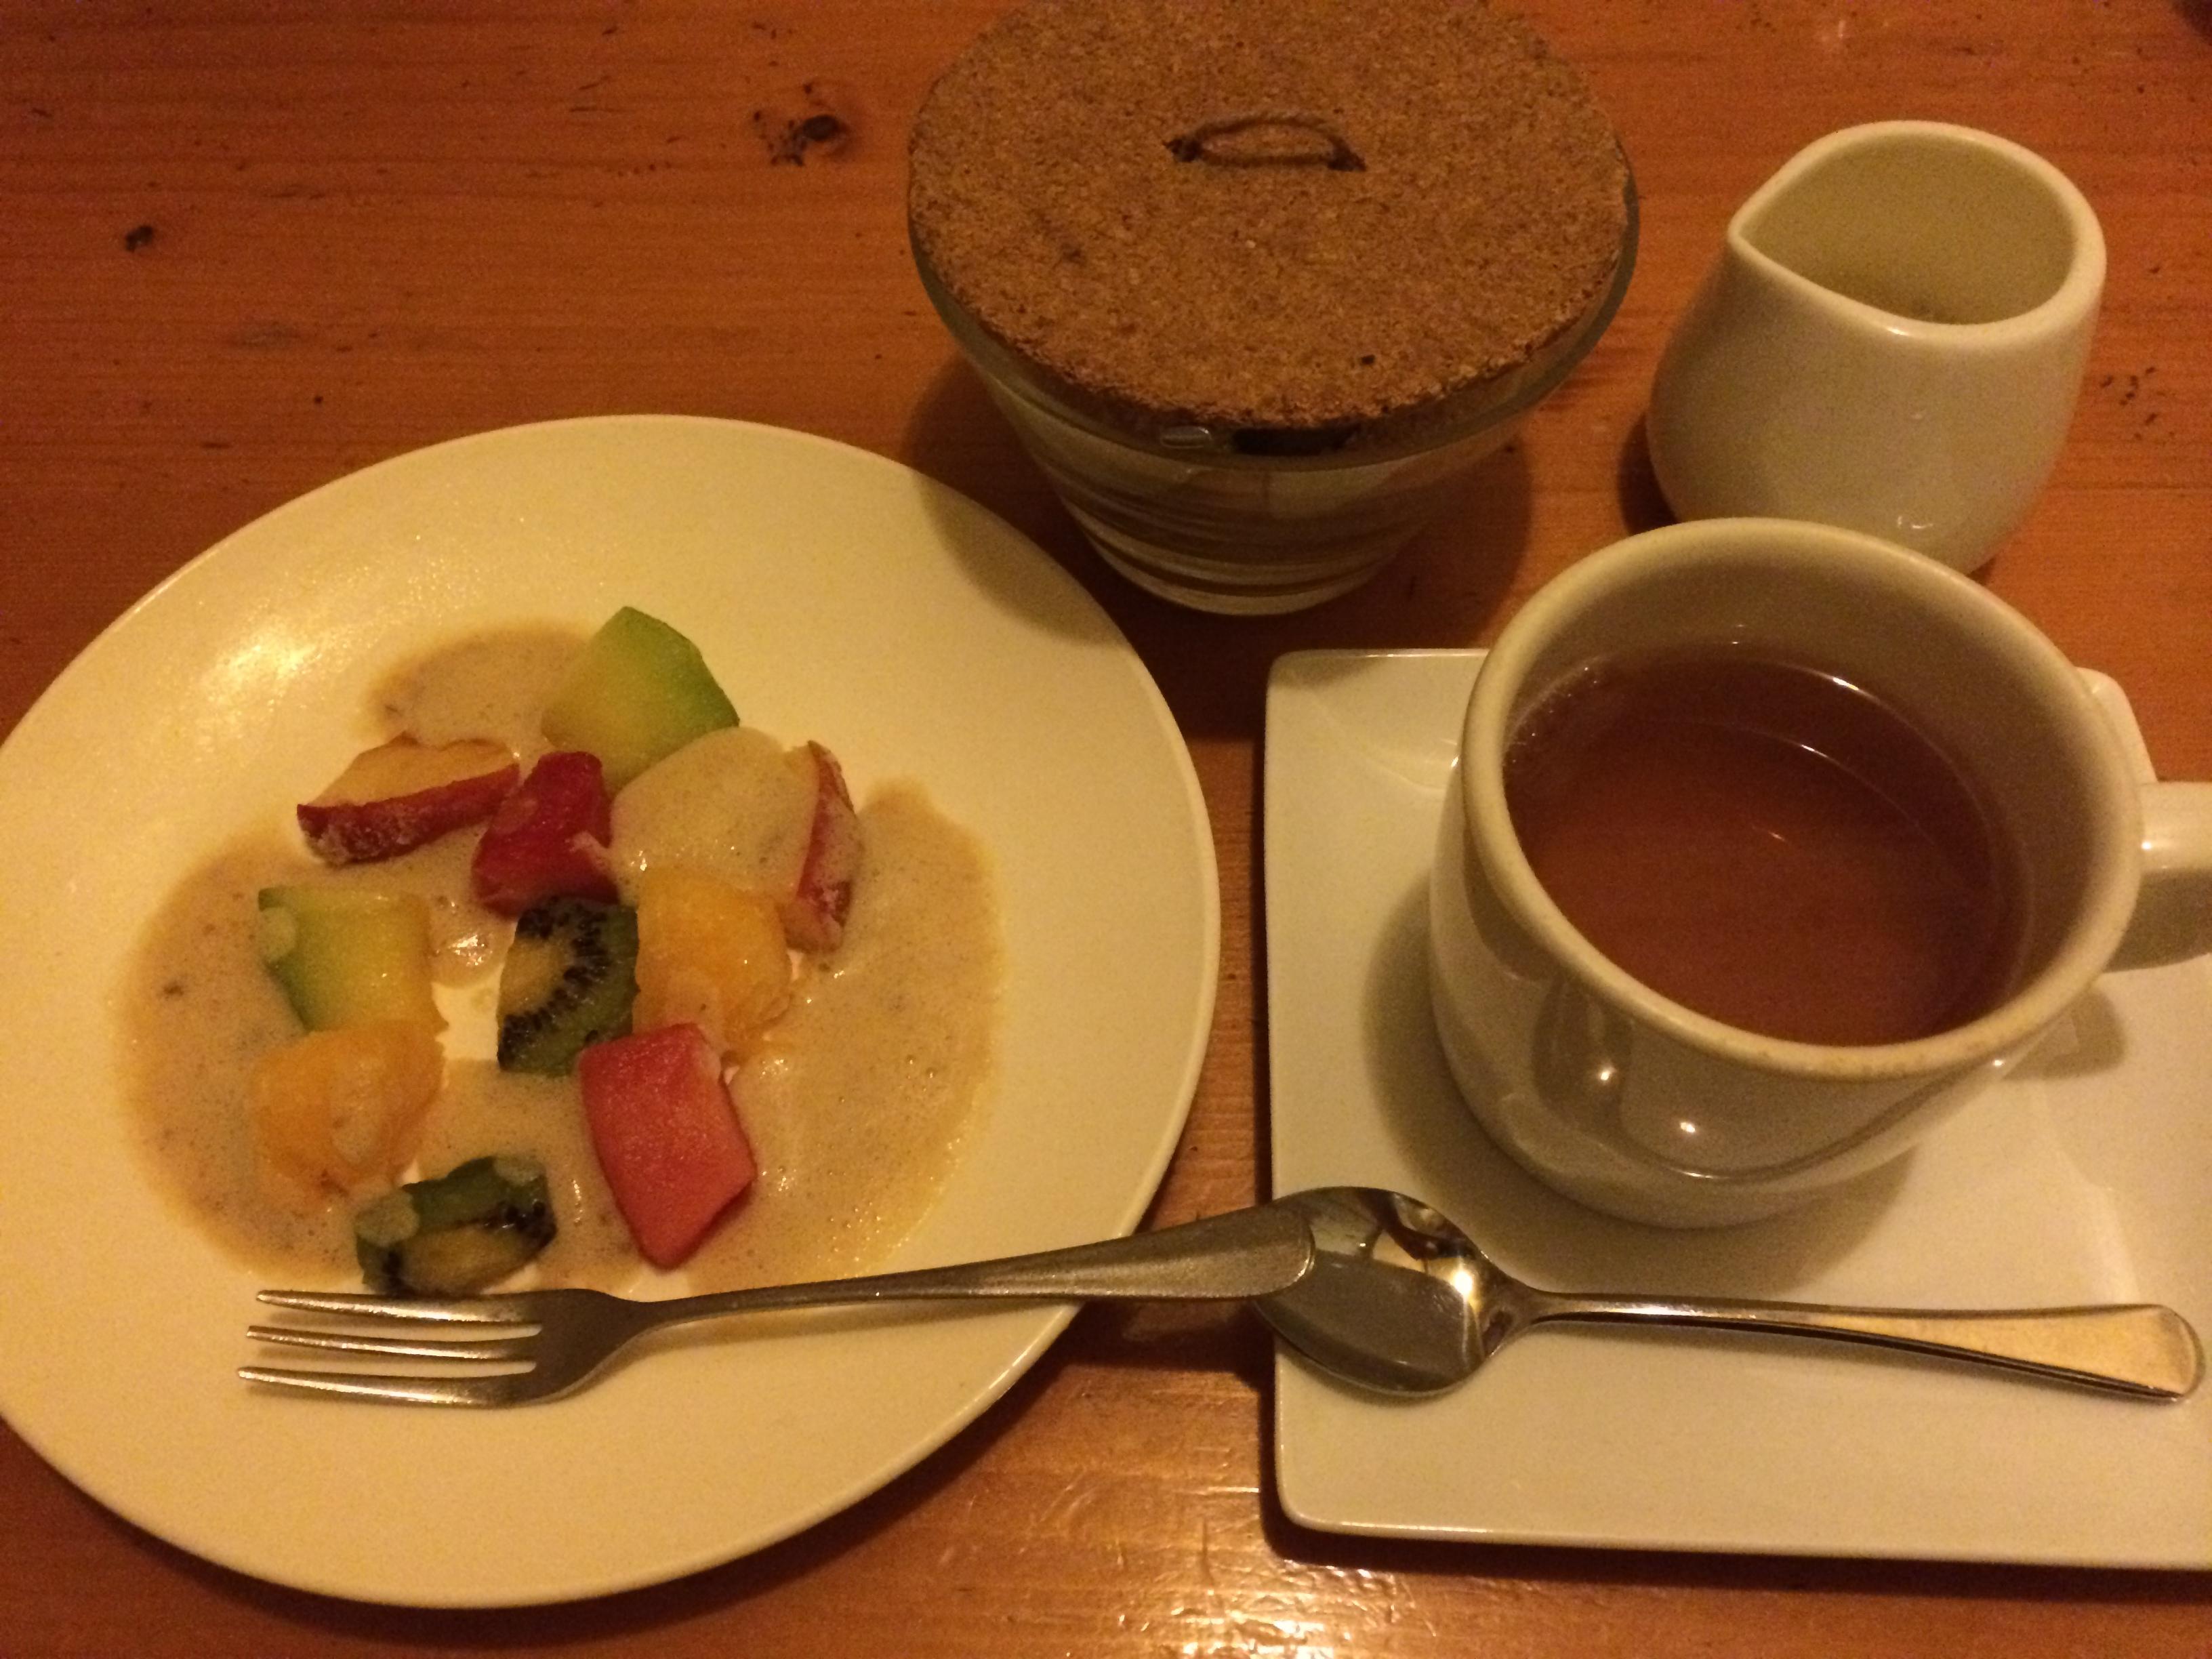 Bistro la fourchette豆乳ヨーグルトとフローズンフルーツと有機アールグレイ紅茶